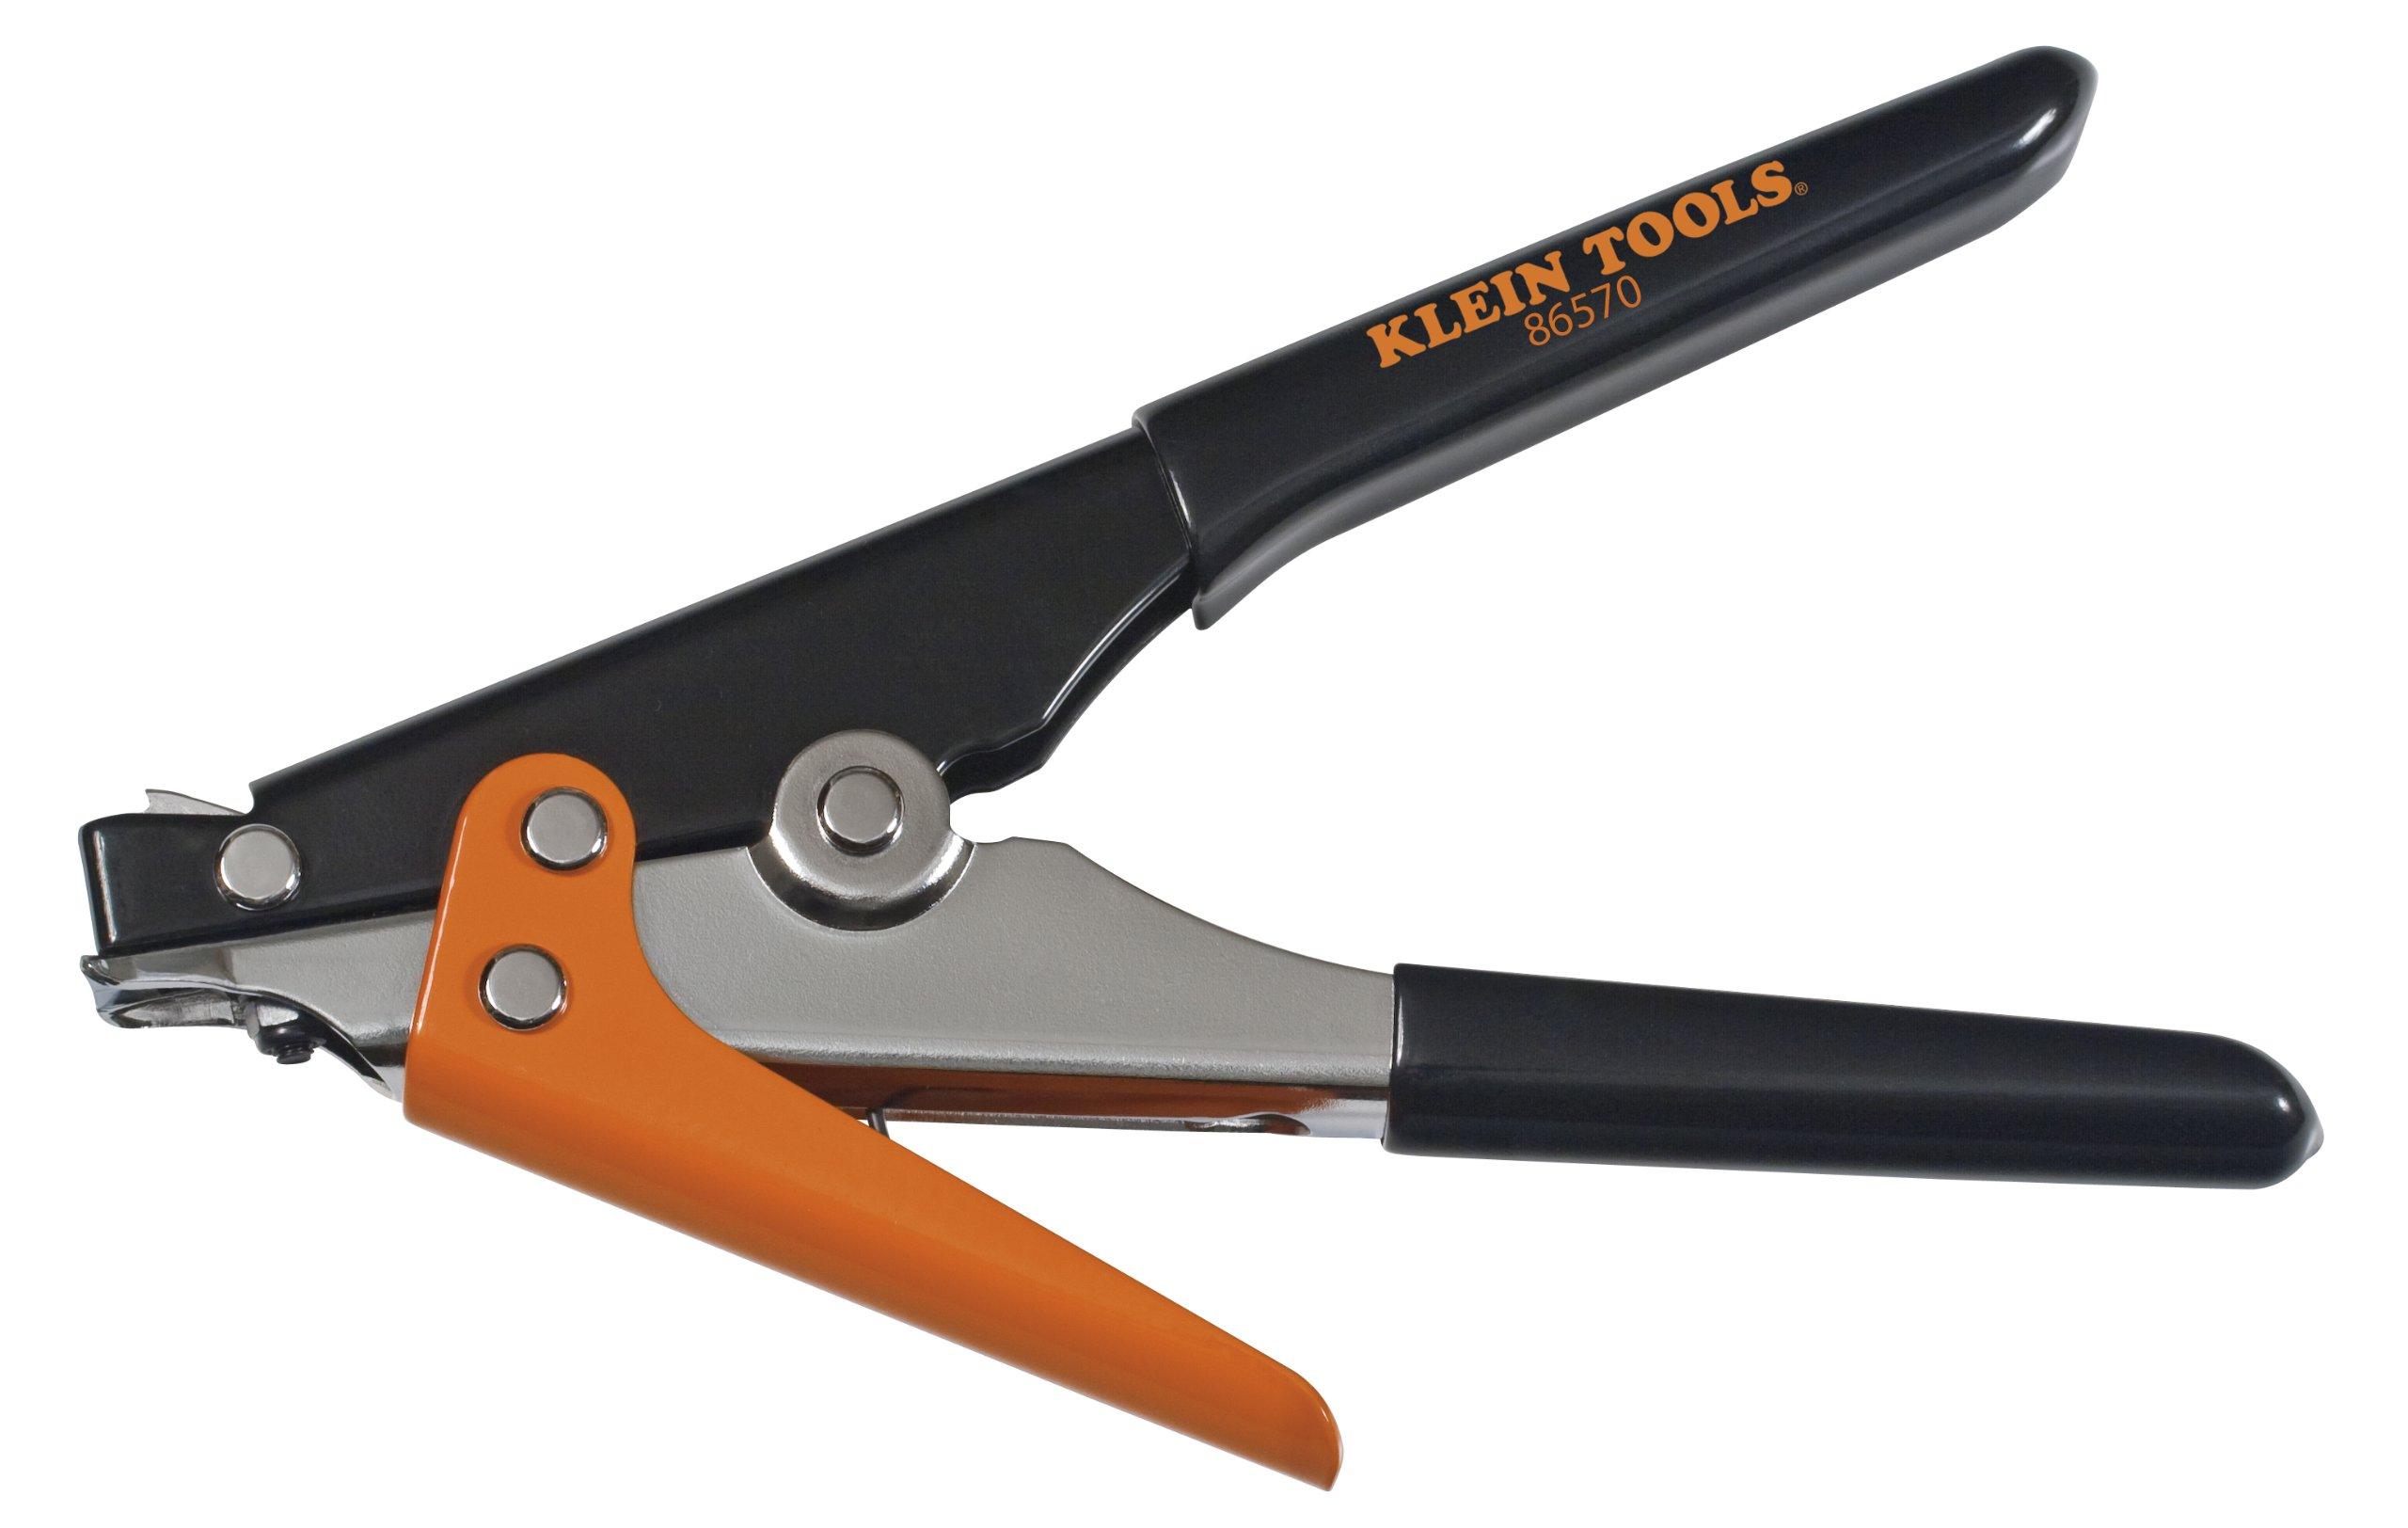 Nylon Tie Tensioning Tool Klein Tools 86570 by Klein Tools (Image #1)